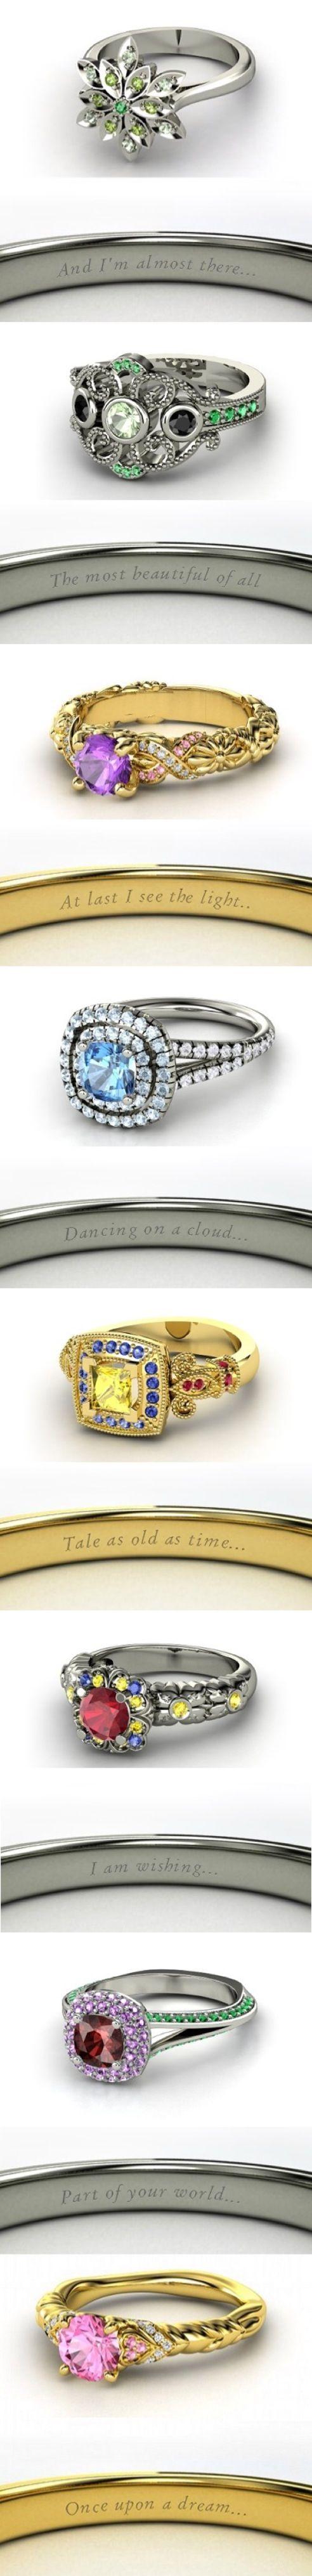 disney wedding rings disney wedding ring Disney RingsDisney JewelryDisney EngagementEngagement